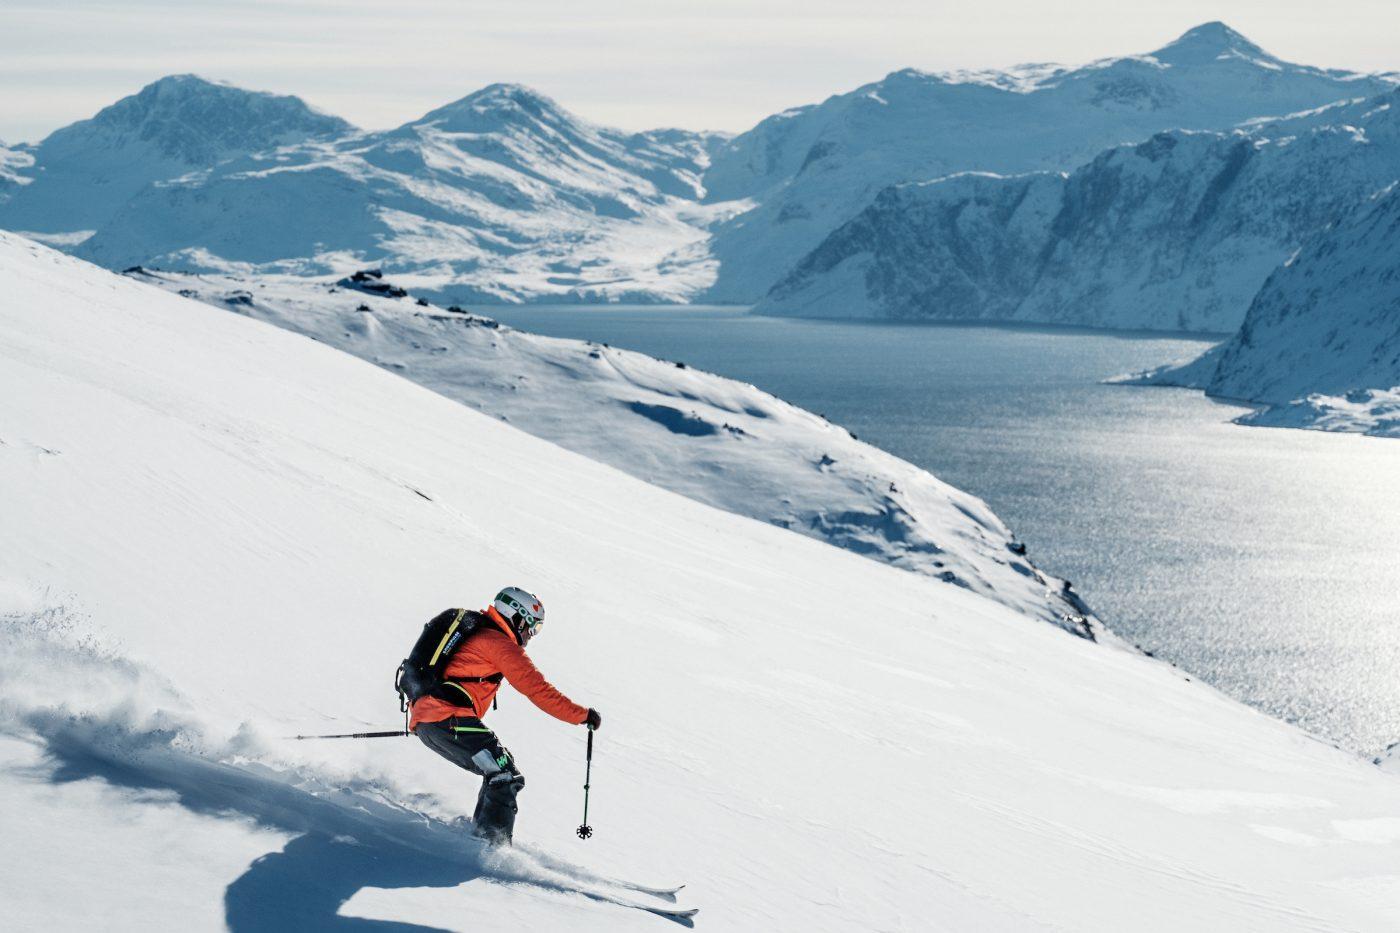 Marcus Walter On Ski Near Qooqqut. Photo by Petter Cohen, Xtravel